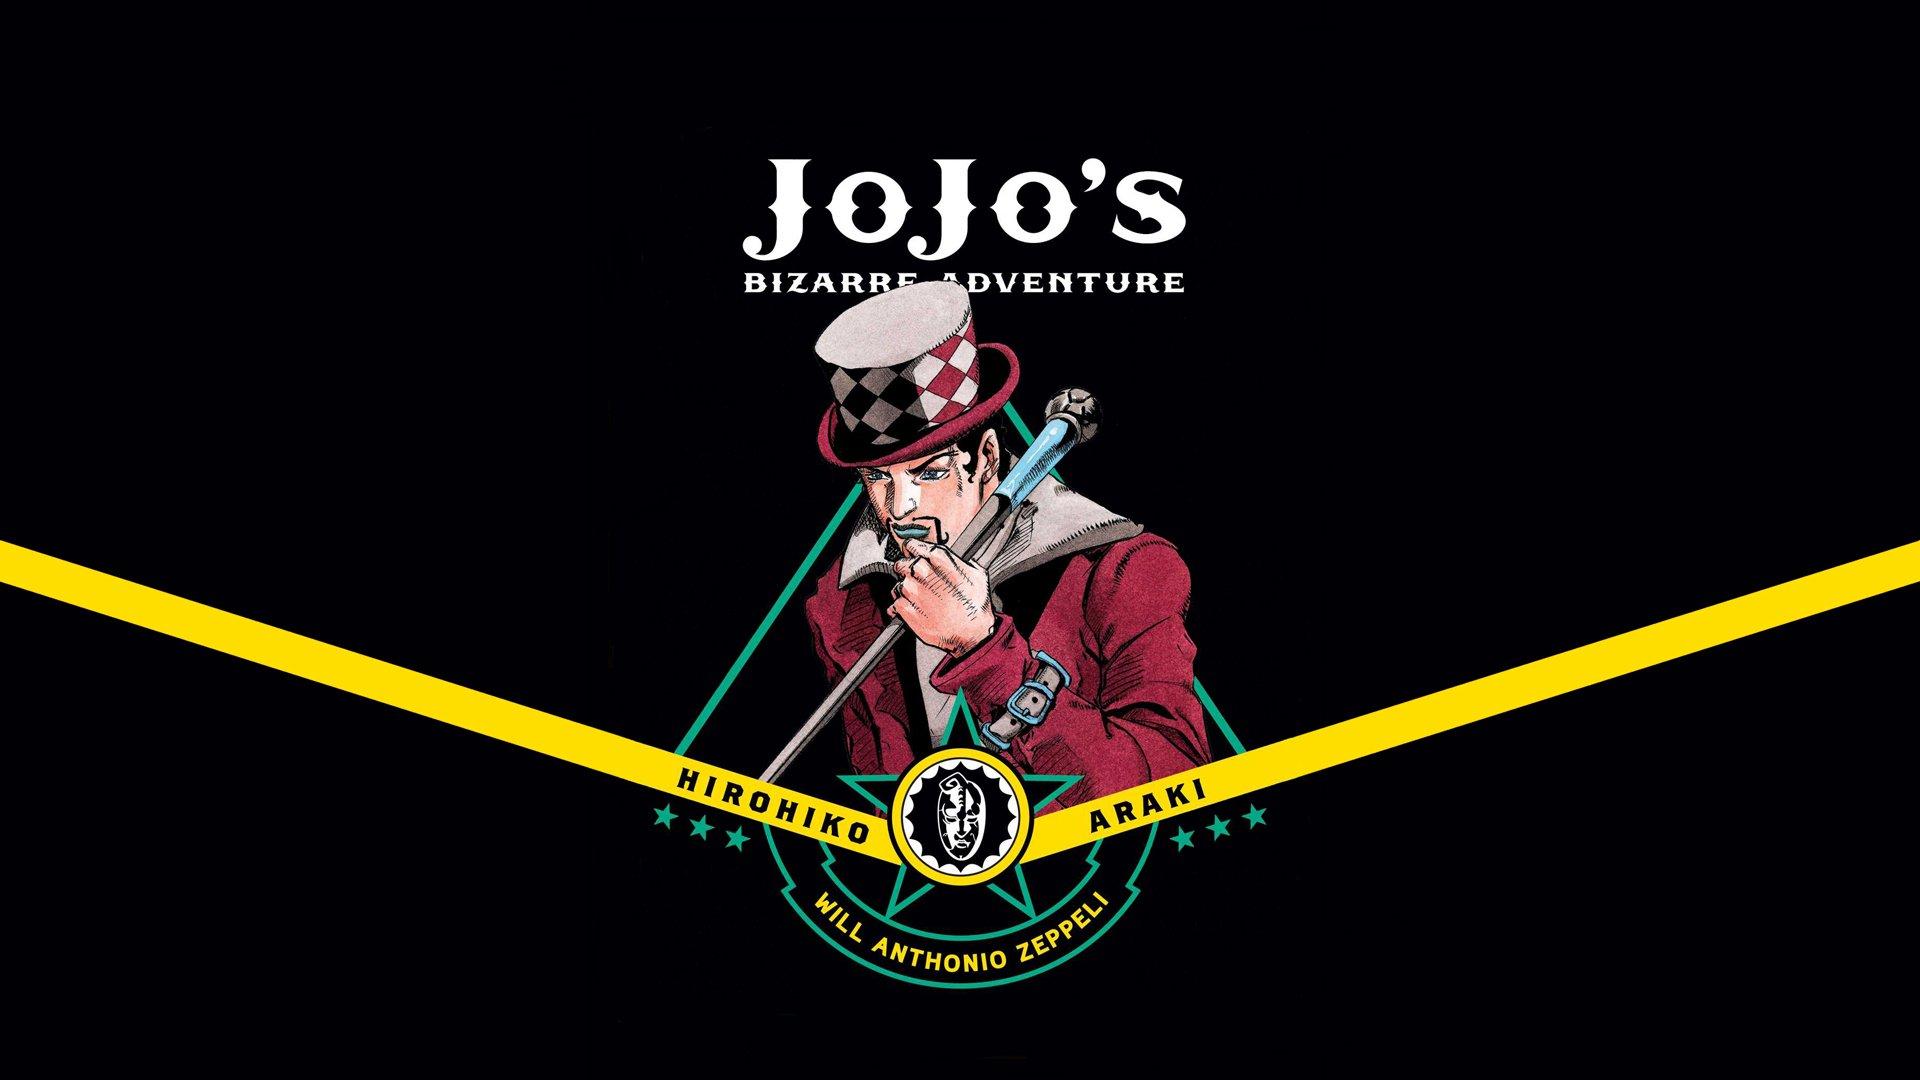 Jojo's Bizarre Adventure Full HD Wallpaper And Background